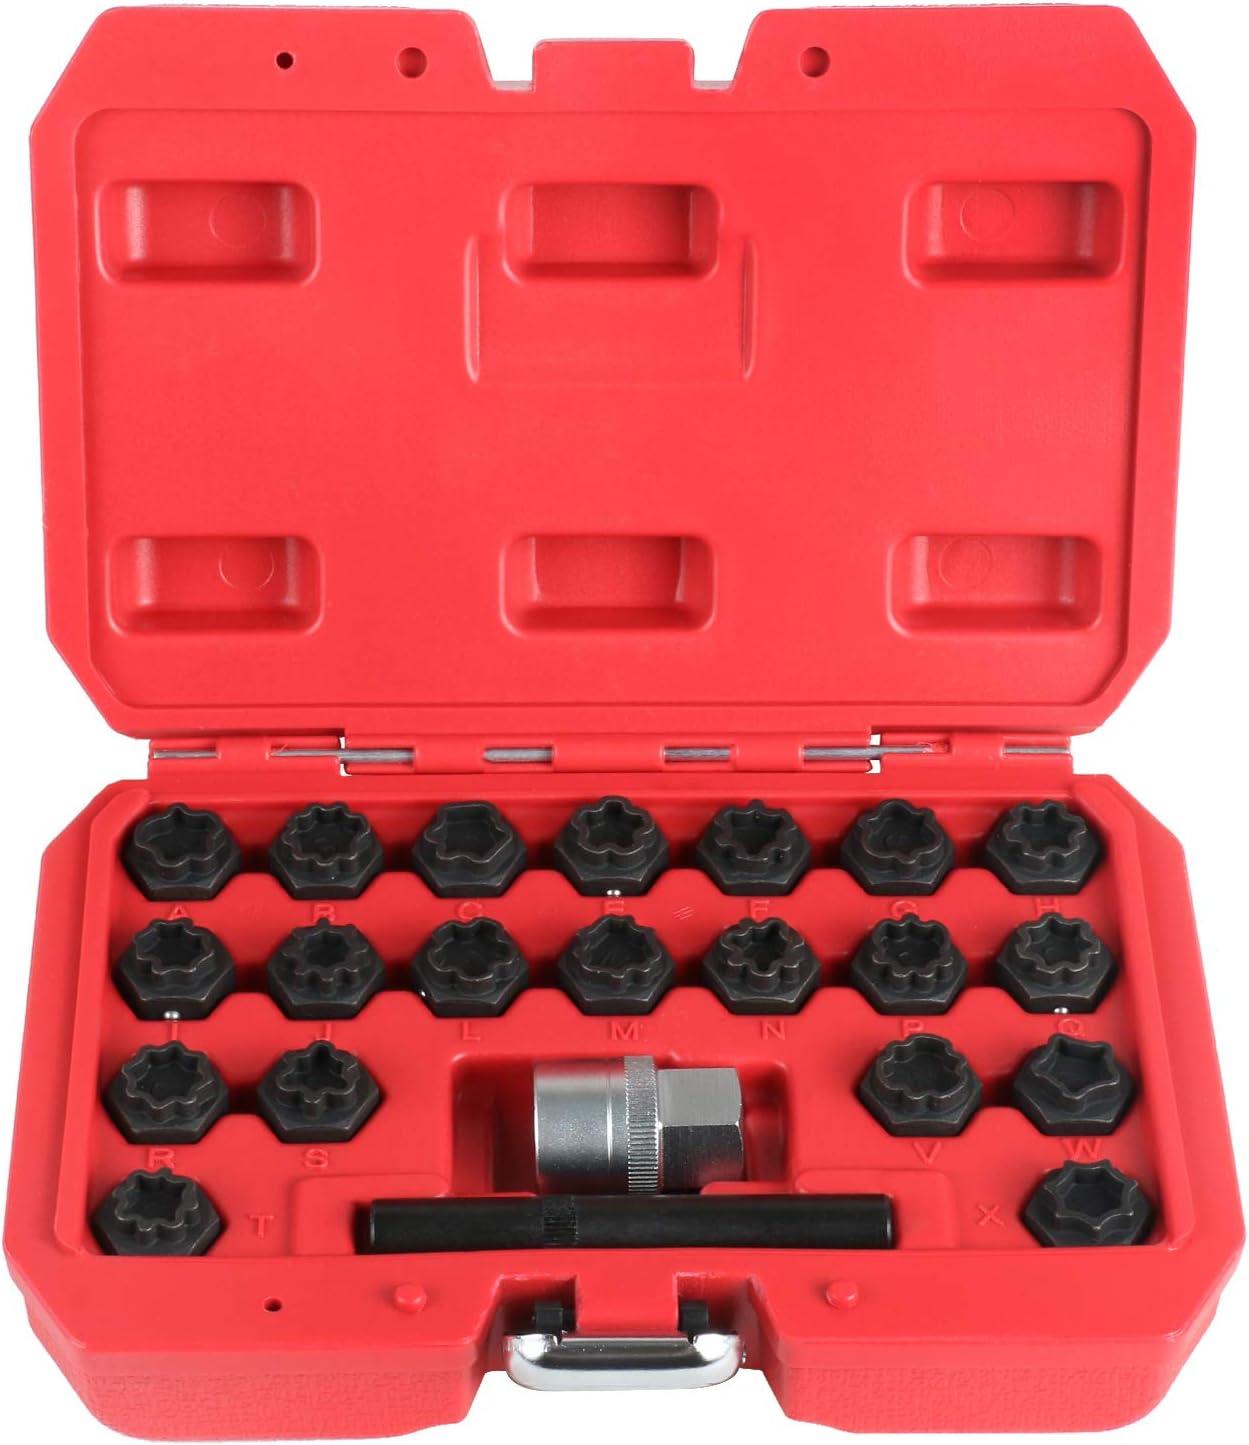 Very popular BELEY 22pcs Wheel Lock Lug Nuts Automotive Removal An Set Super-cheap